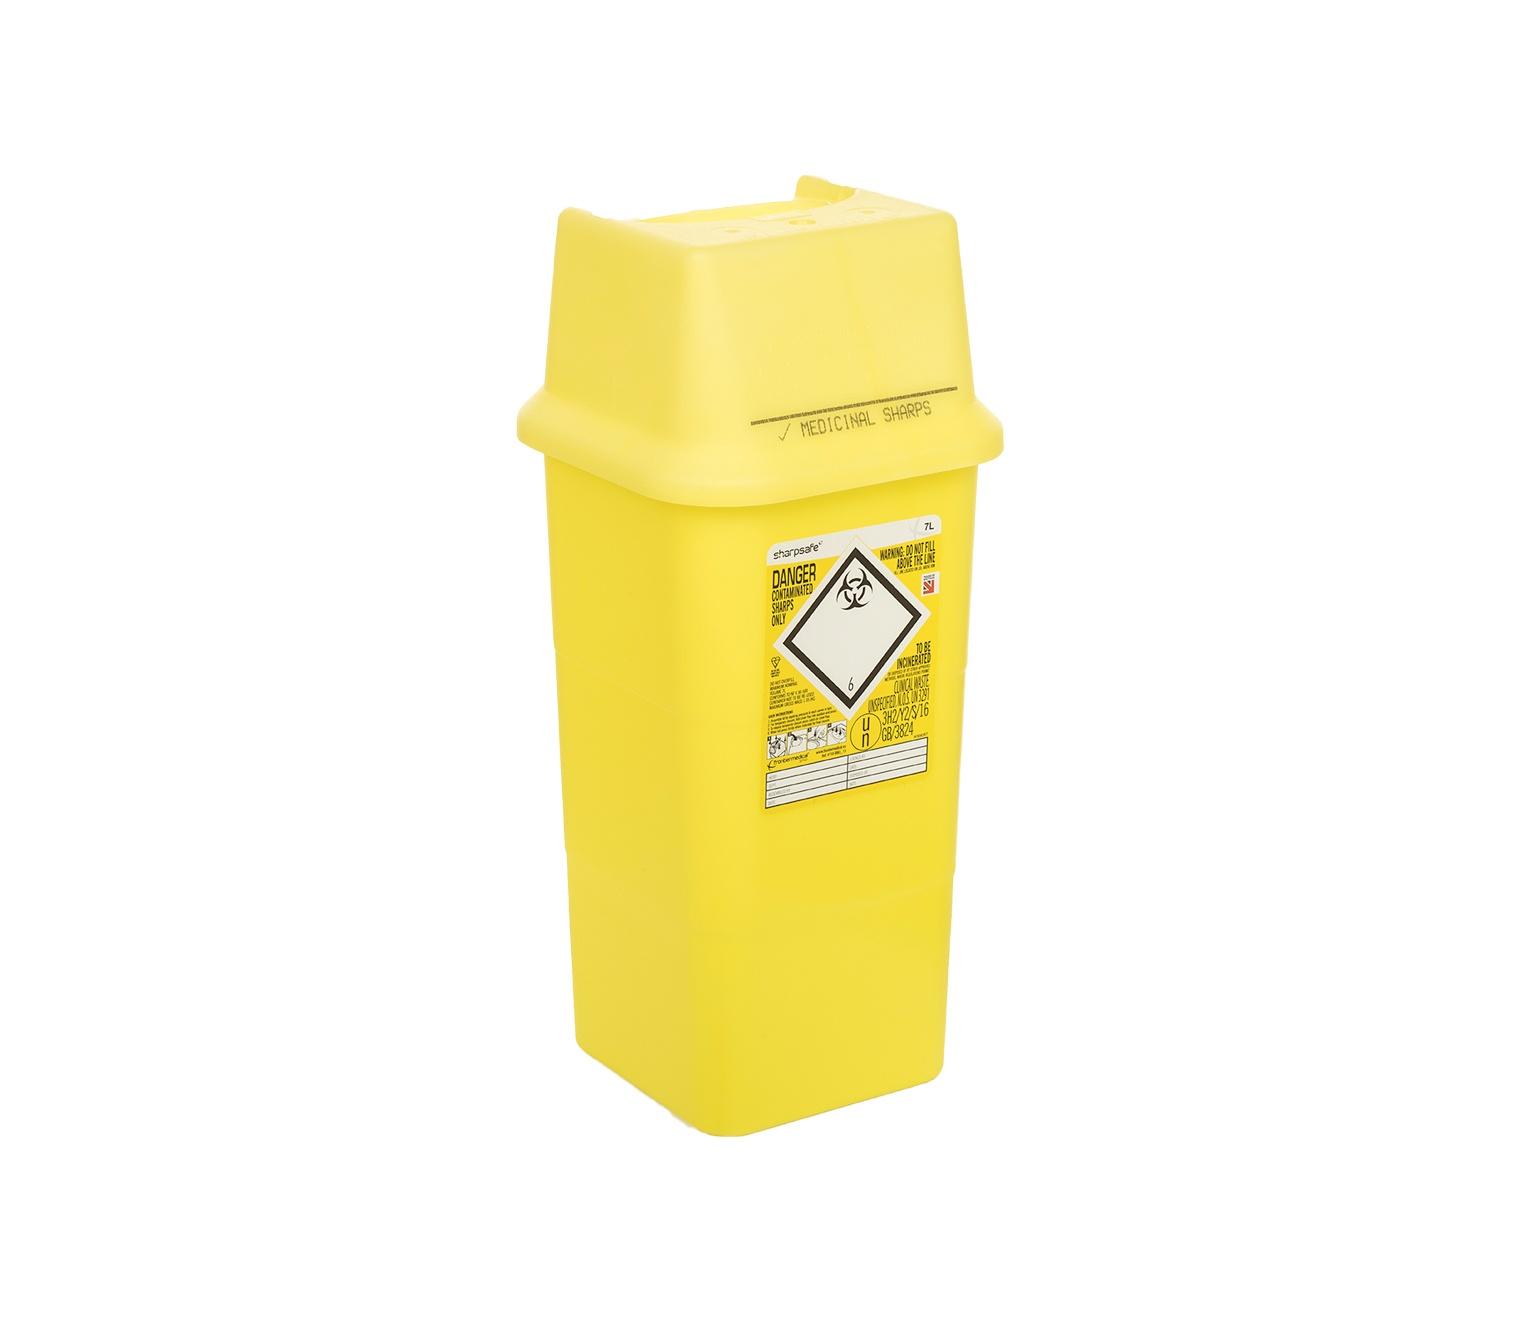 Sharpsguard 7 Litre Yellow